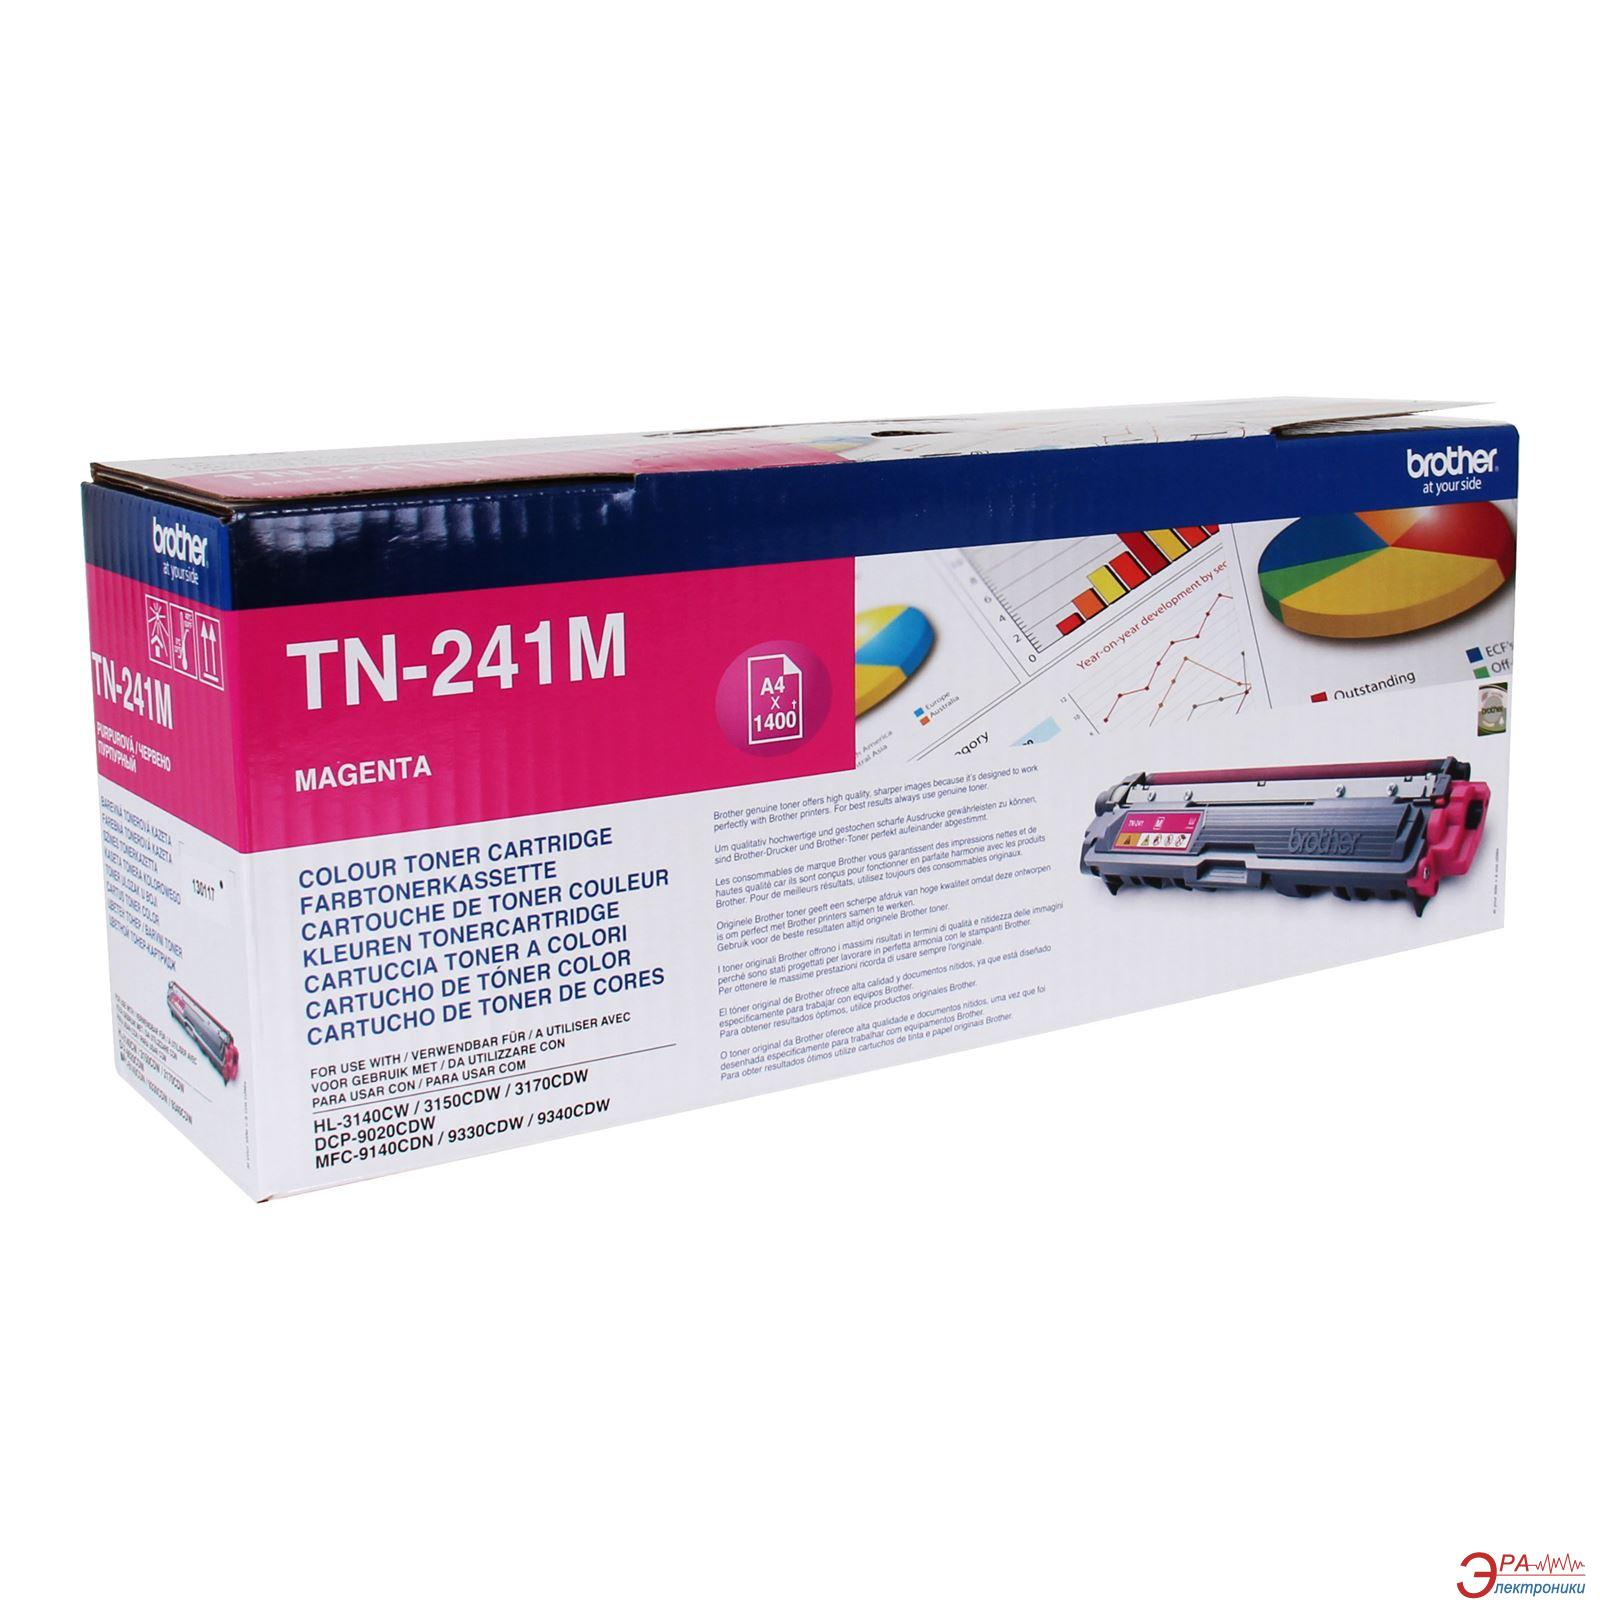 Картридж Brother TN241M (TN241M) (DCP-9020CDW, HL-3140CW) Magenta